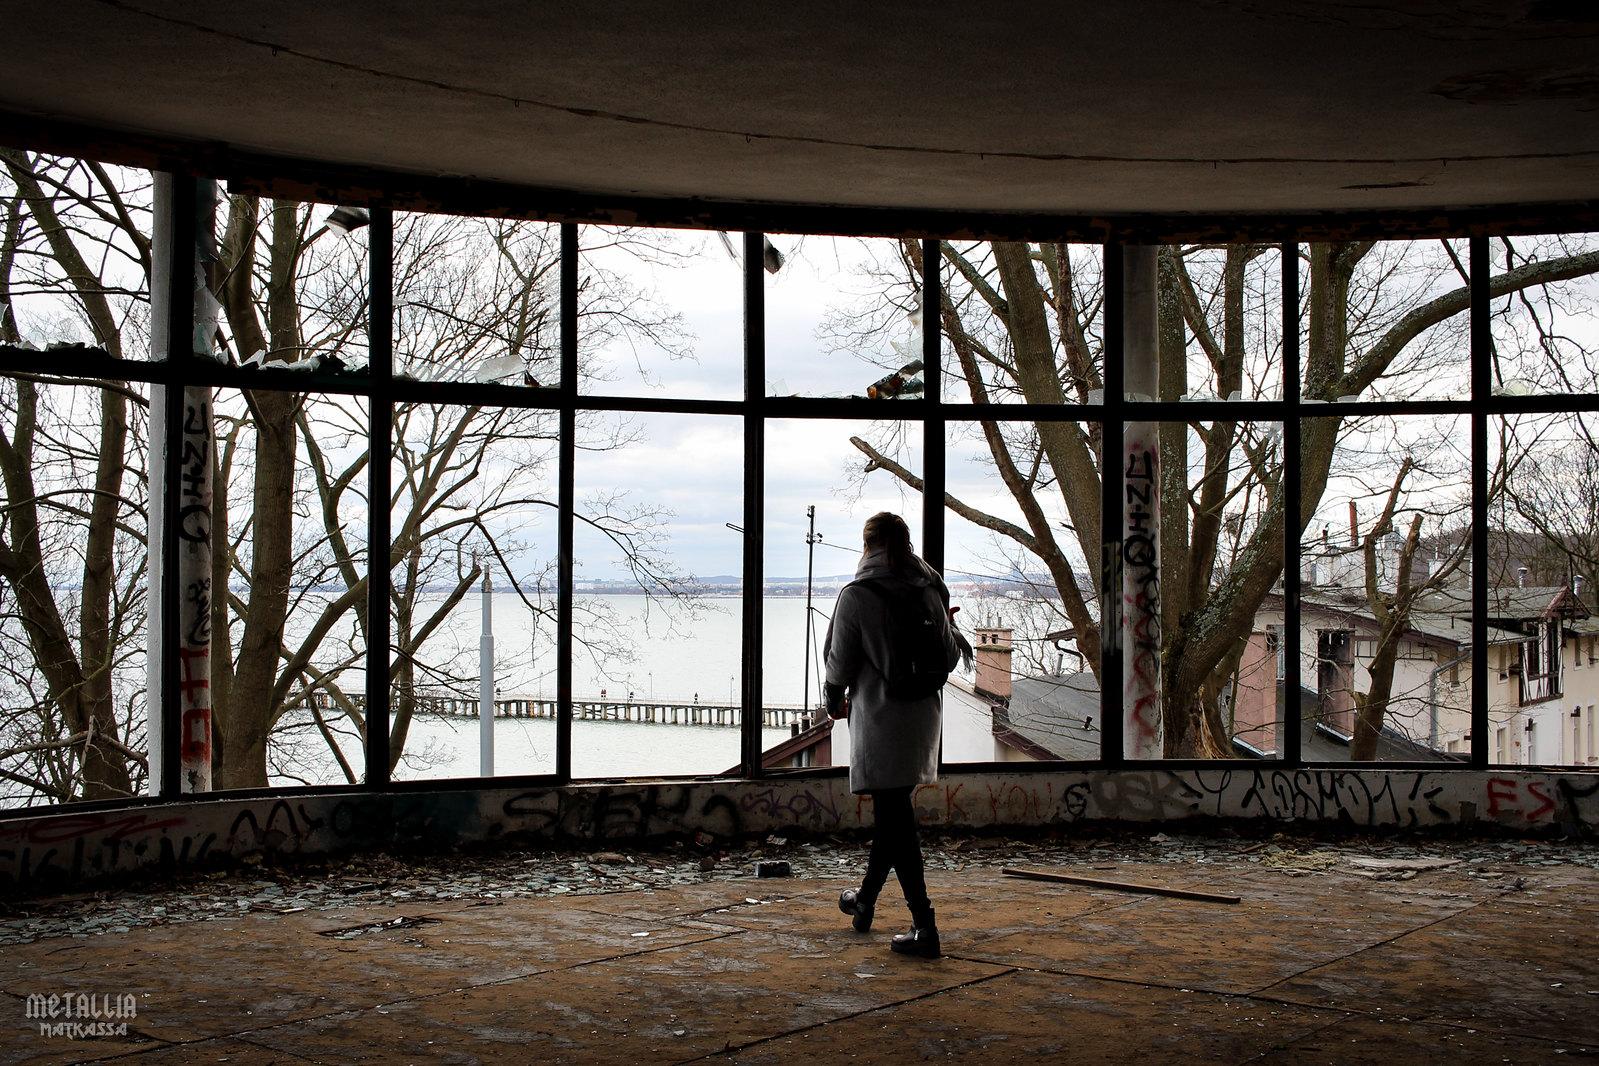 orlowo sanatorium, Sanatorium w Orłowie, abandoned hotels, urban exploration, urbex, hylätyt hotellit, gdynia, visit gdynia